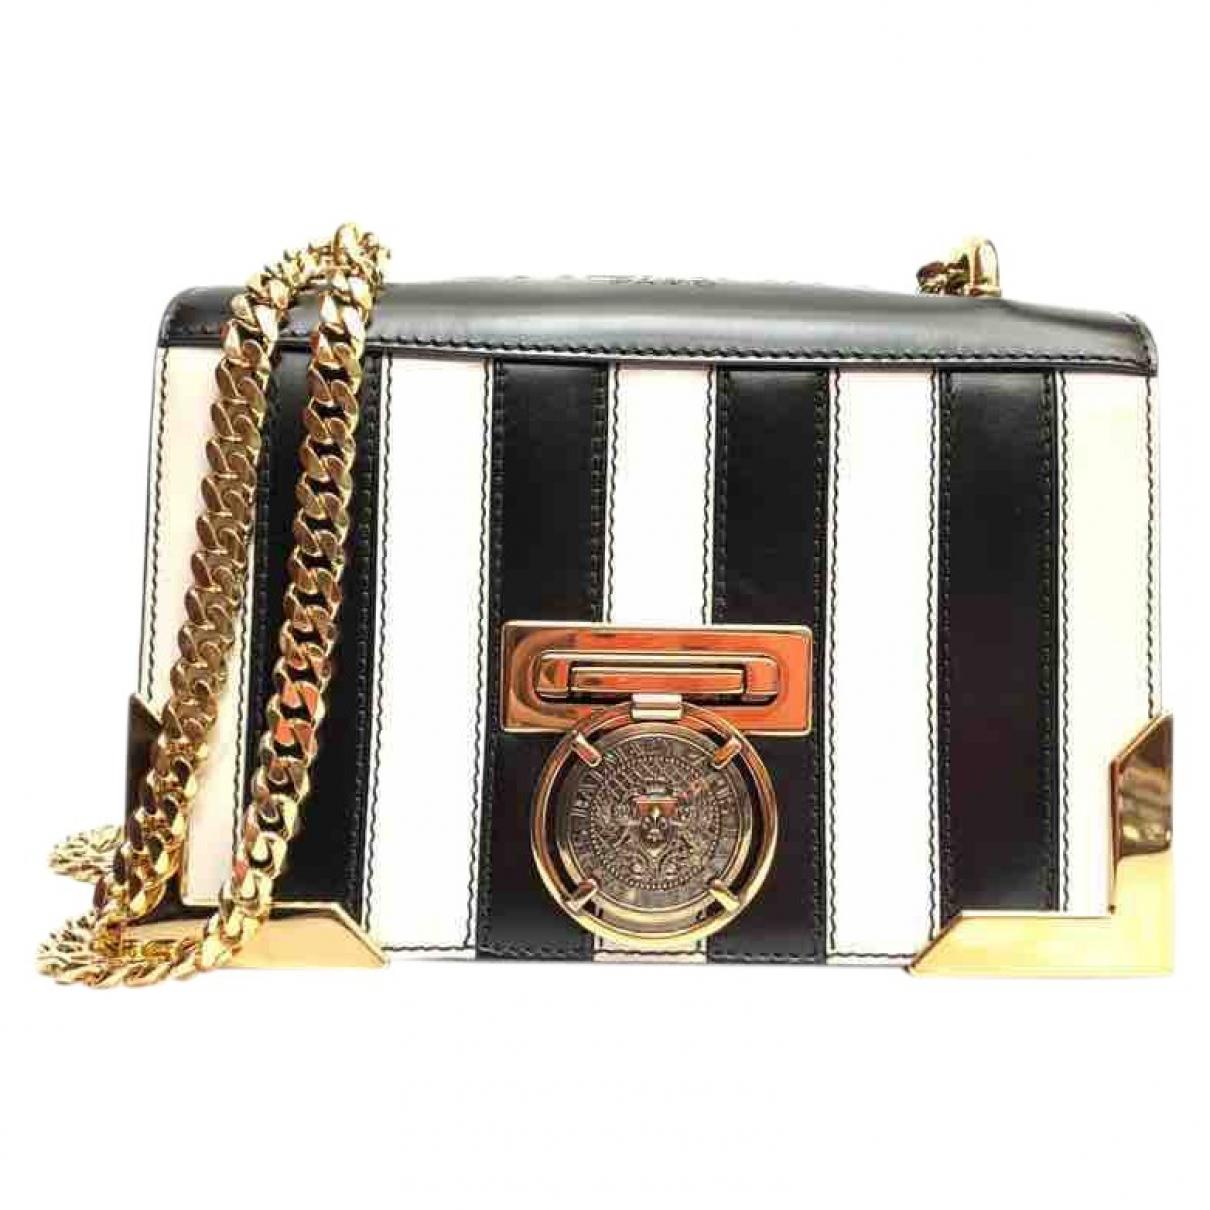 Balmain \N Multicolour Leather handbag for Women \N